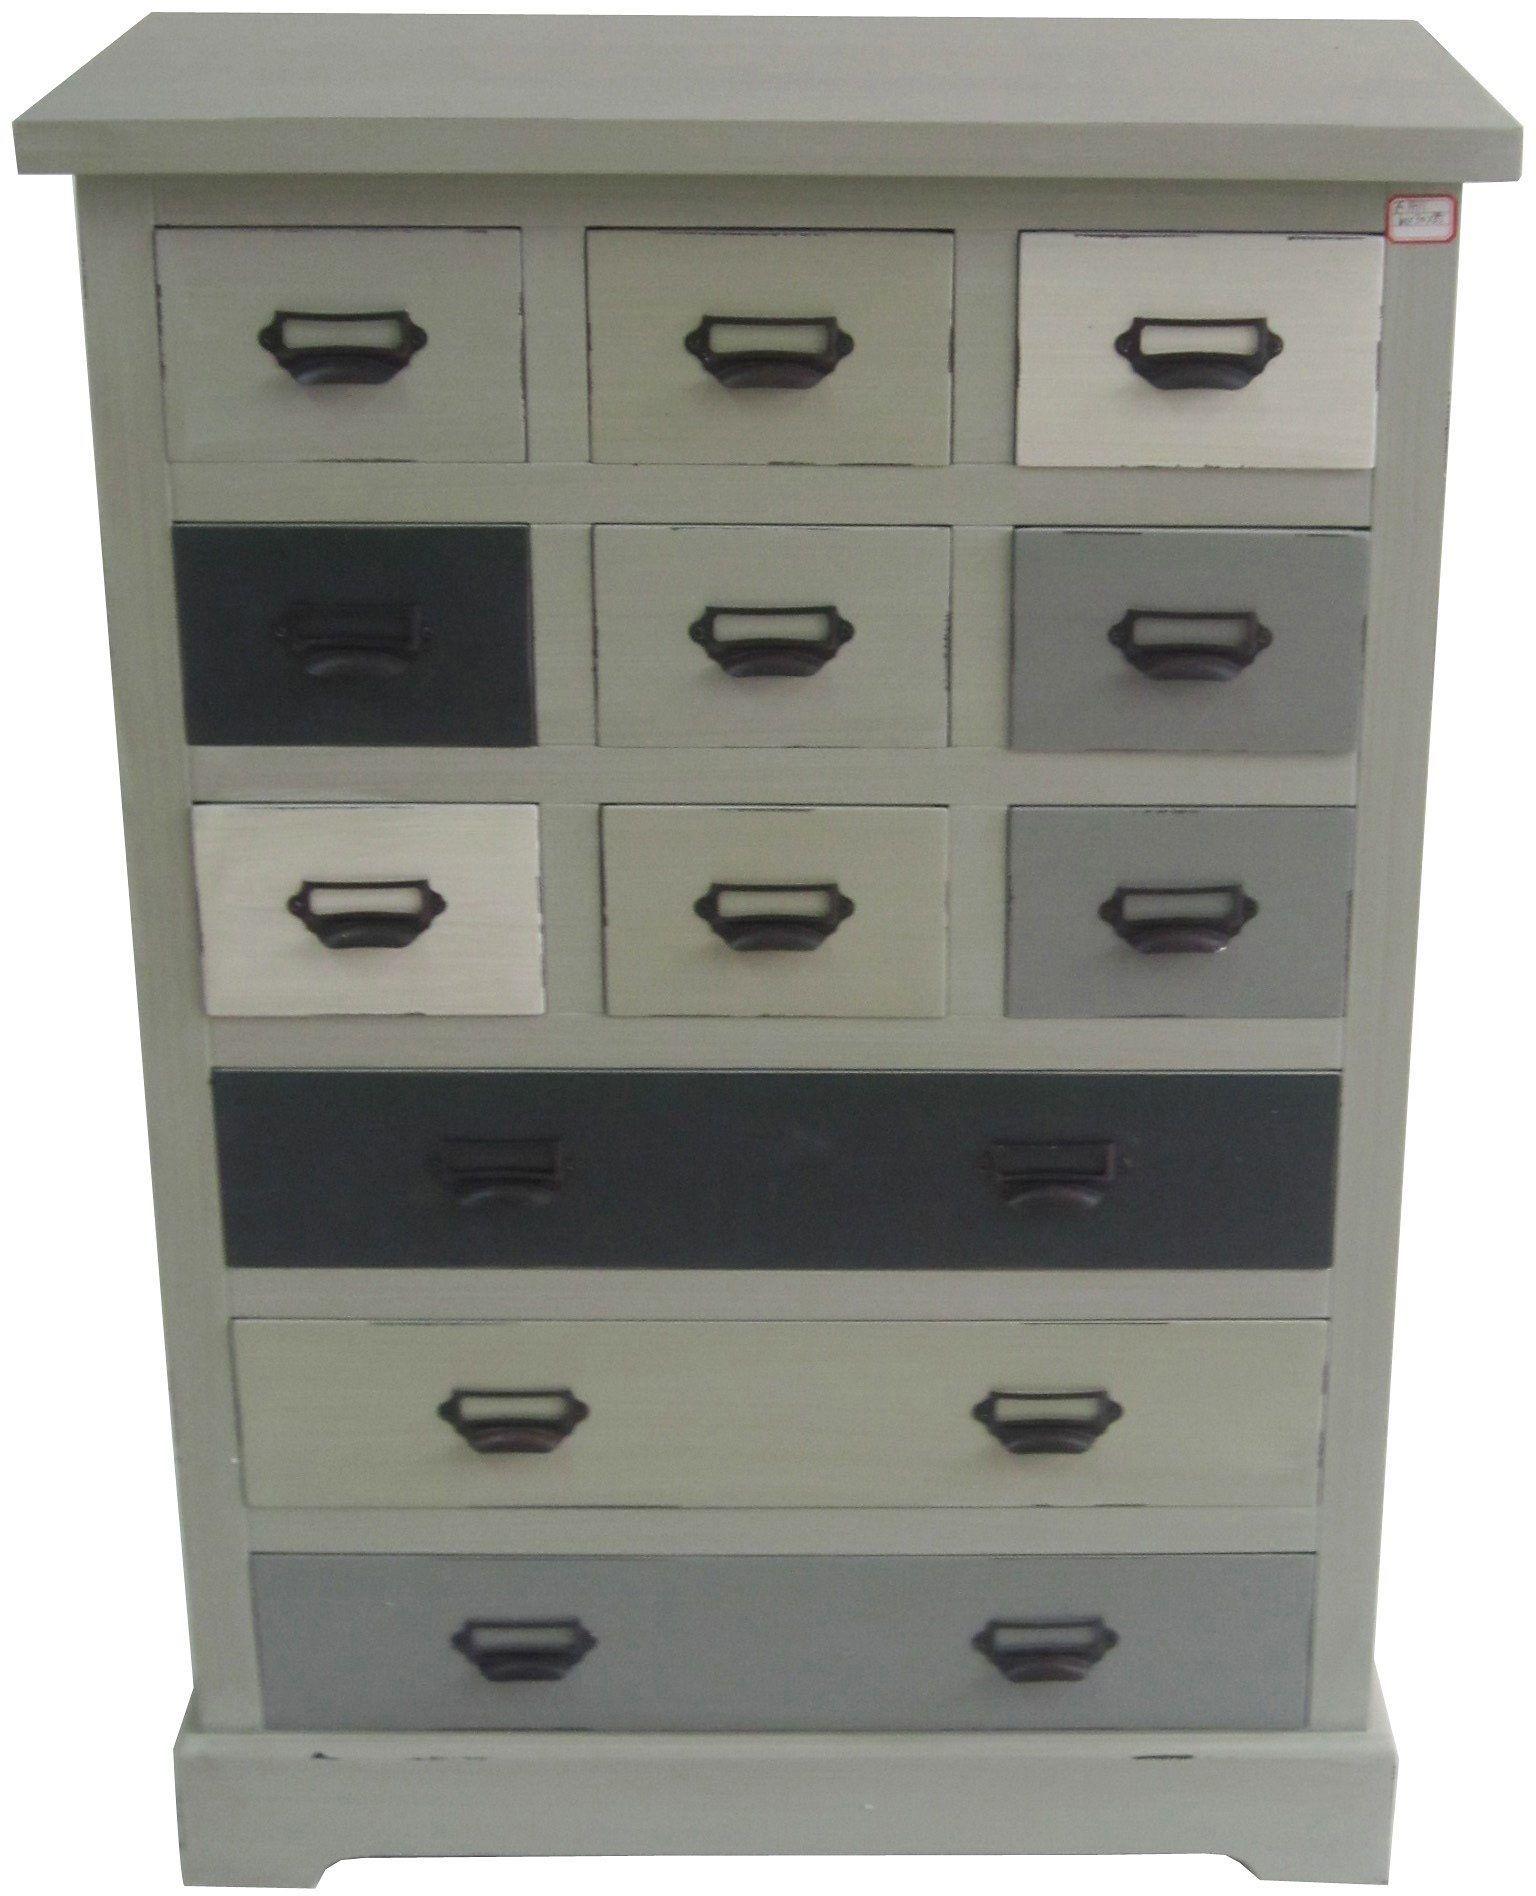 Kommode »Forest« grau, pflegeleichte Oberfläche, mit Schubkästen, FSC®-zertifiziert, SIT-Möbel Jetzt bestellen unter: https://moebel.ladendirekt.de/wohnzimmer/schraenke/kommoden/?uid=4db40026-37e5-54ea-a4db-1e09898e43f8&utm_source=pinterest&utm_medium=pin&utm_campaign=boards